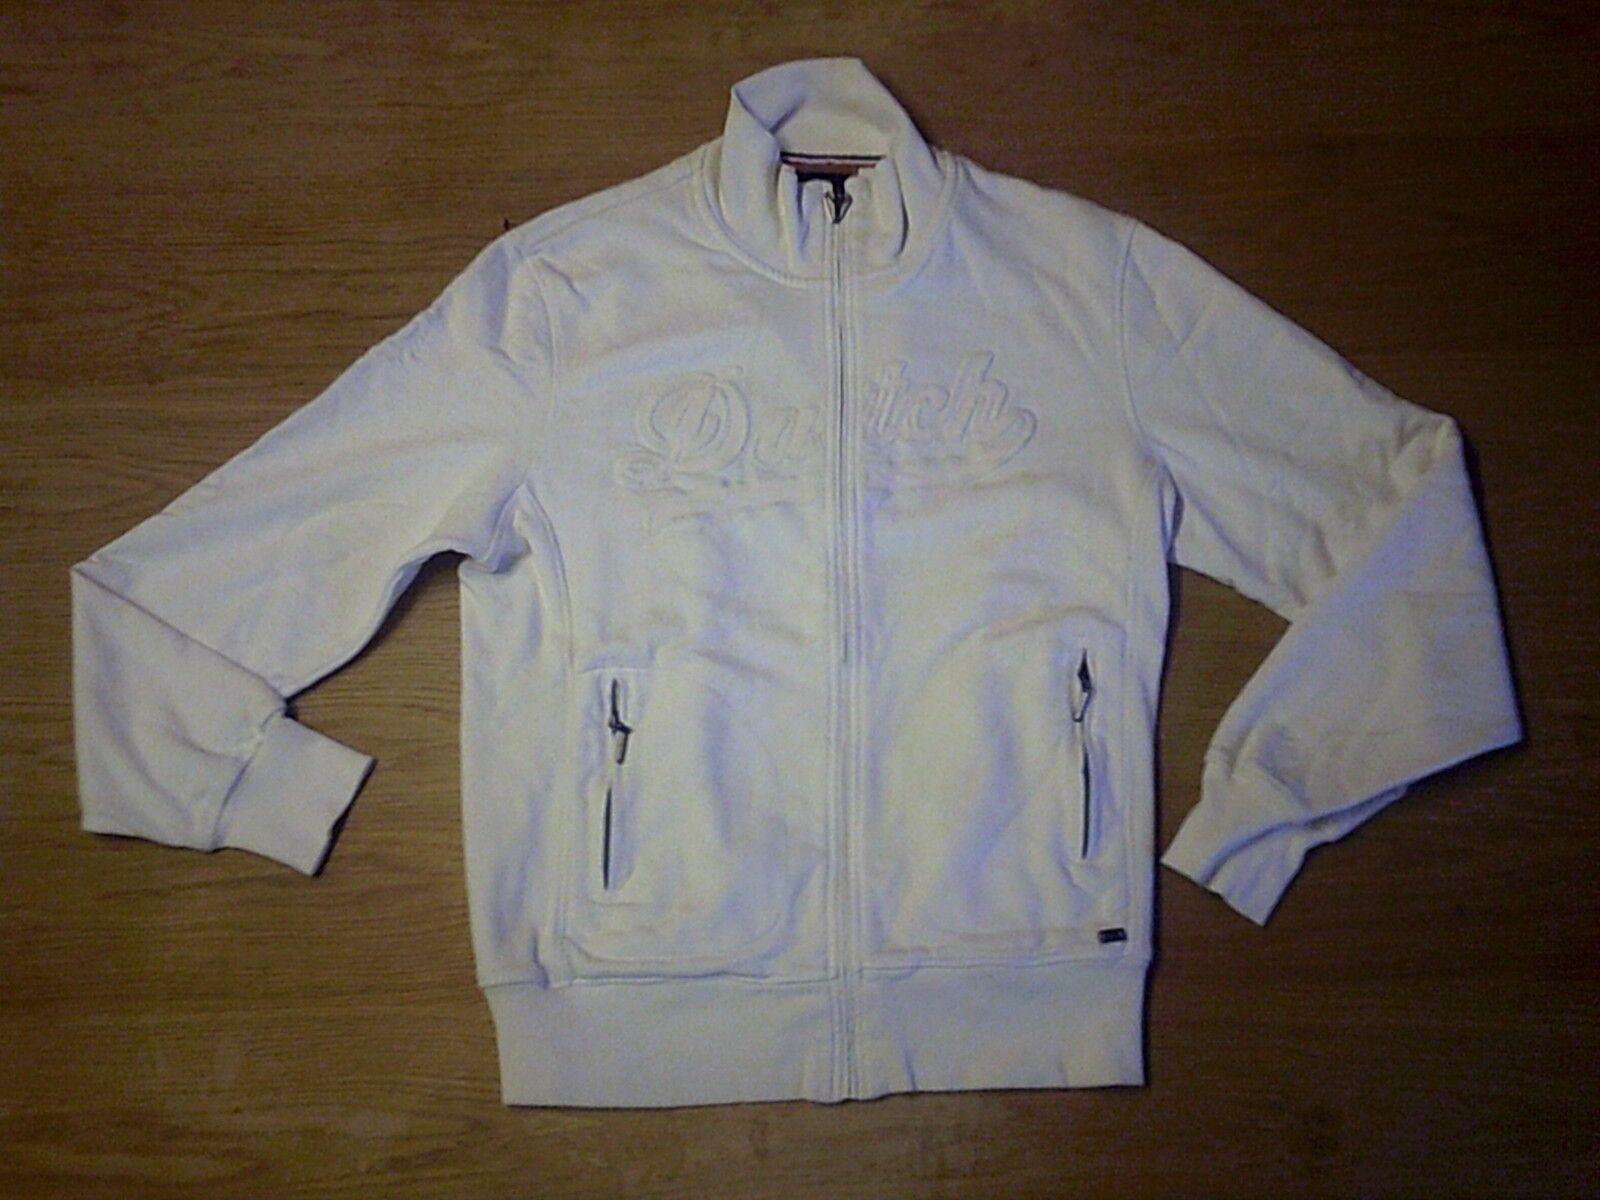 DATCH sudadera Jersey de cremallera completa para hombre Talla L Ropa  Jersey Casual Ropa L 58a64c 893975e3ee081